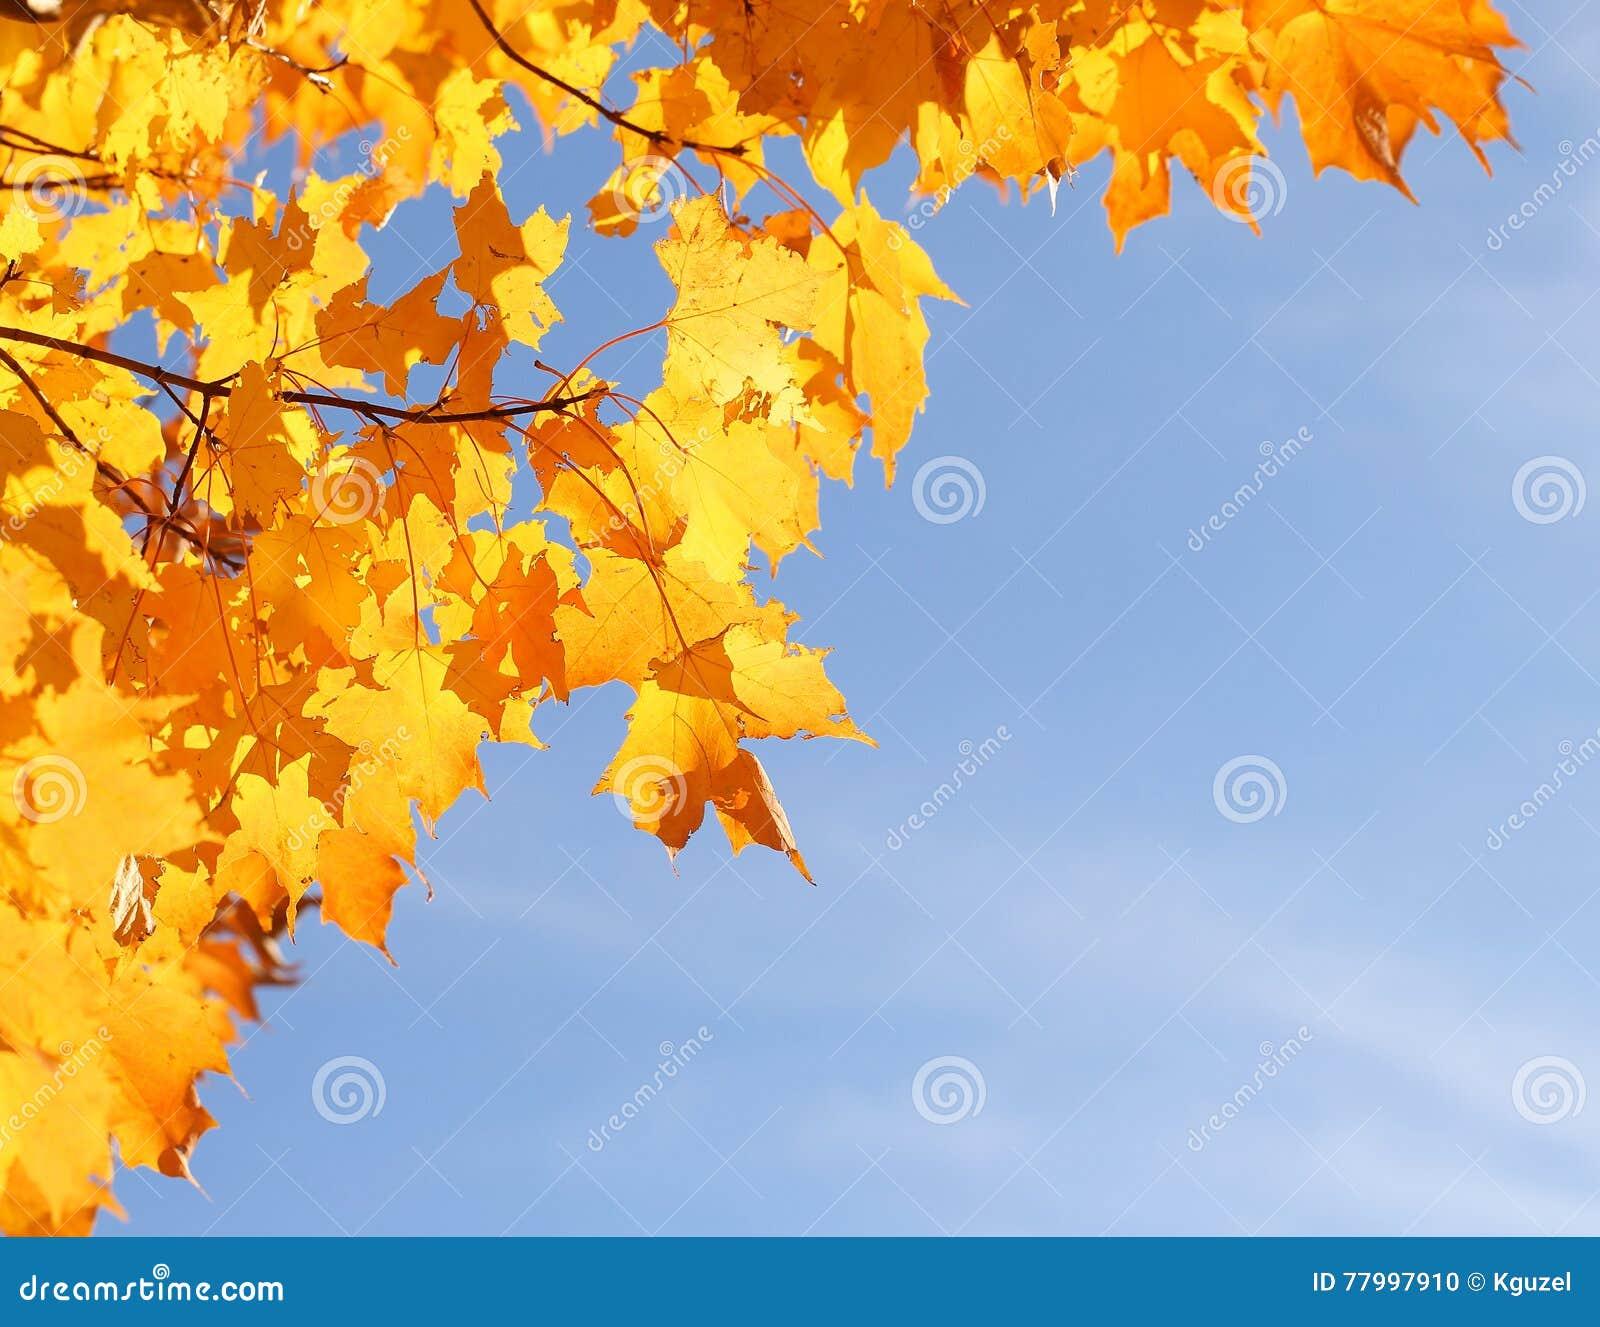 Autumn Yellow Maple Leaves over Blauwe Hemel